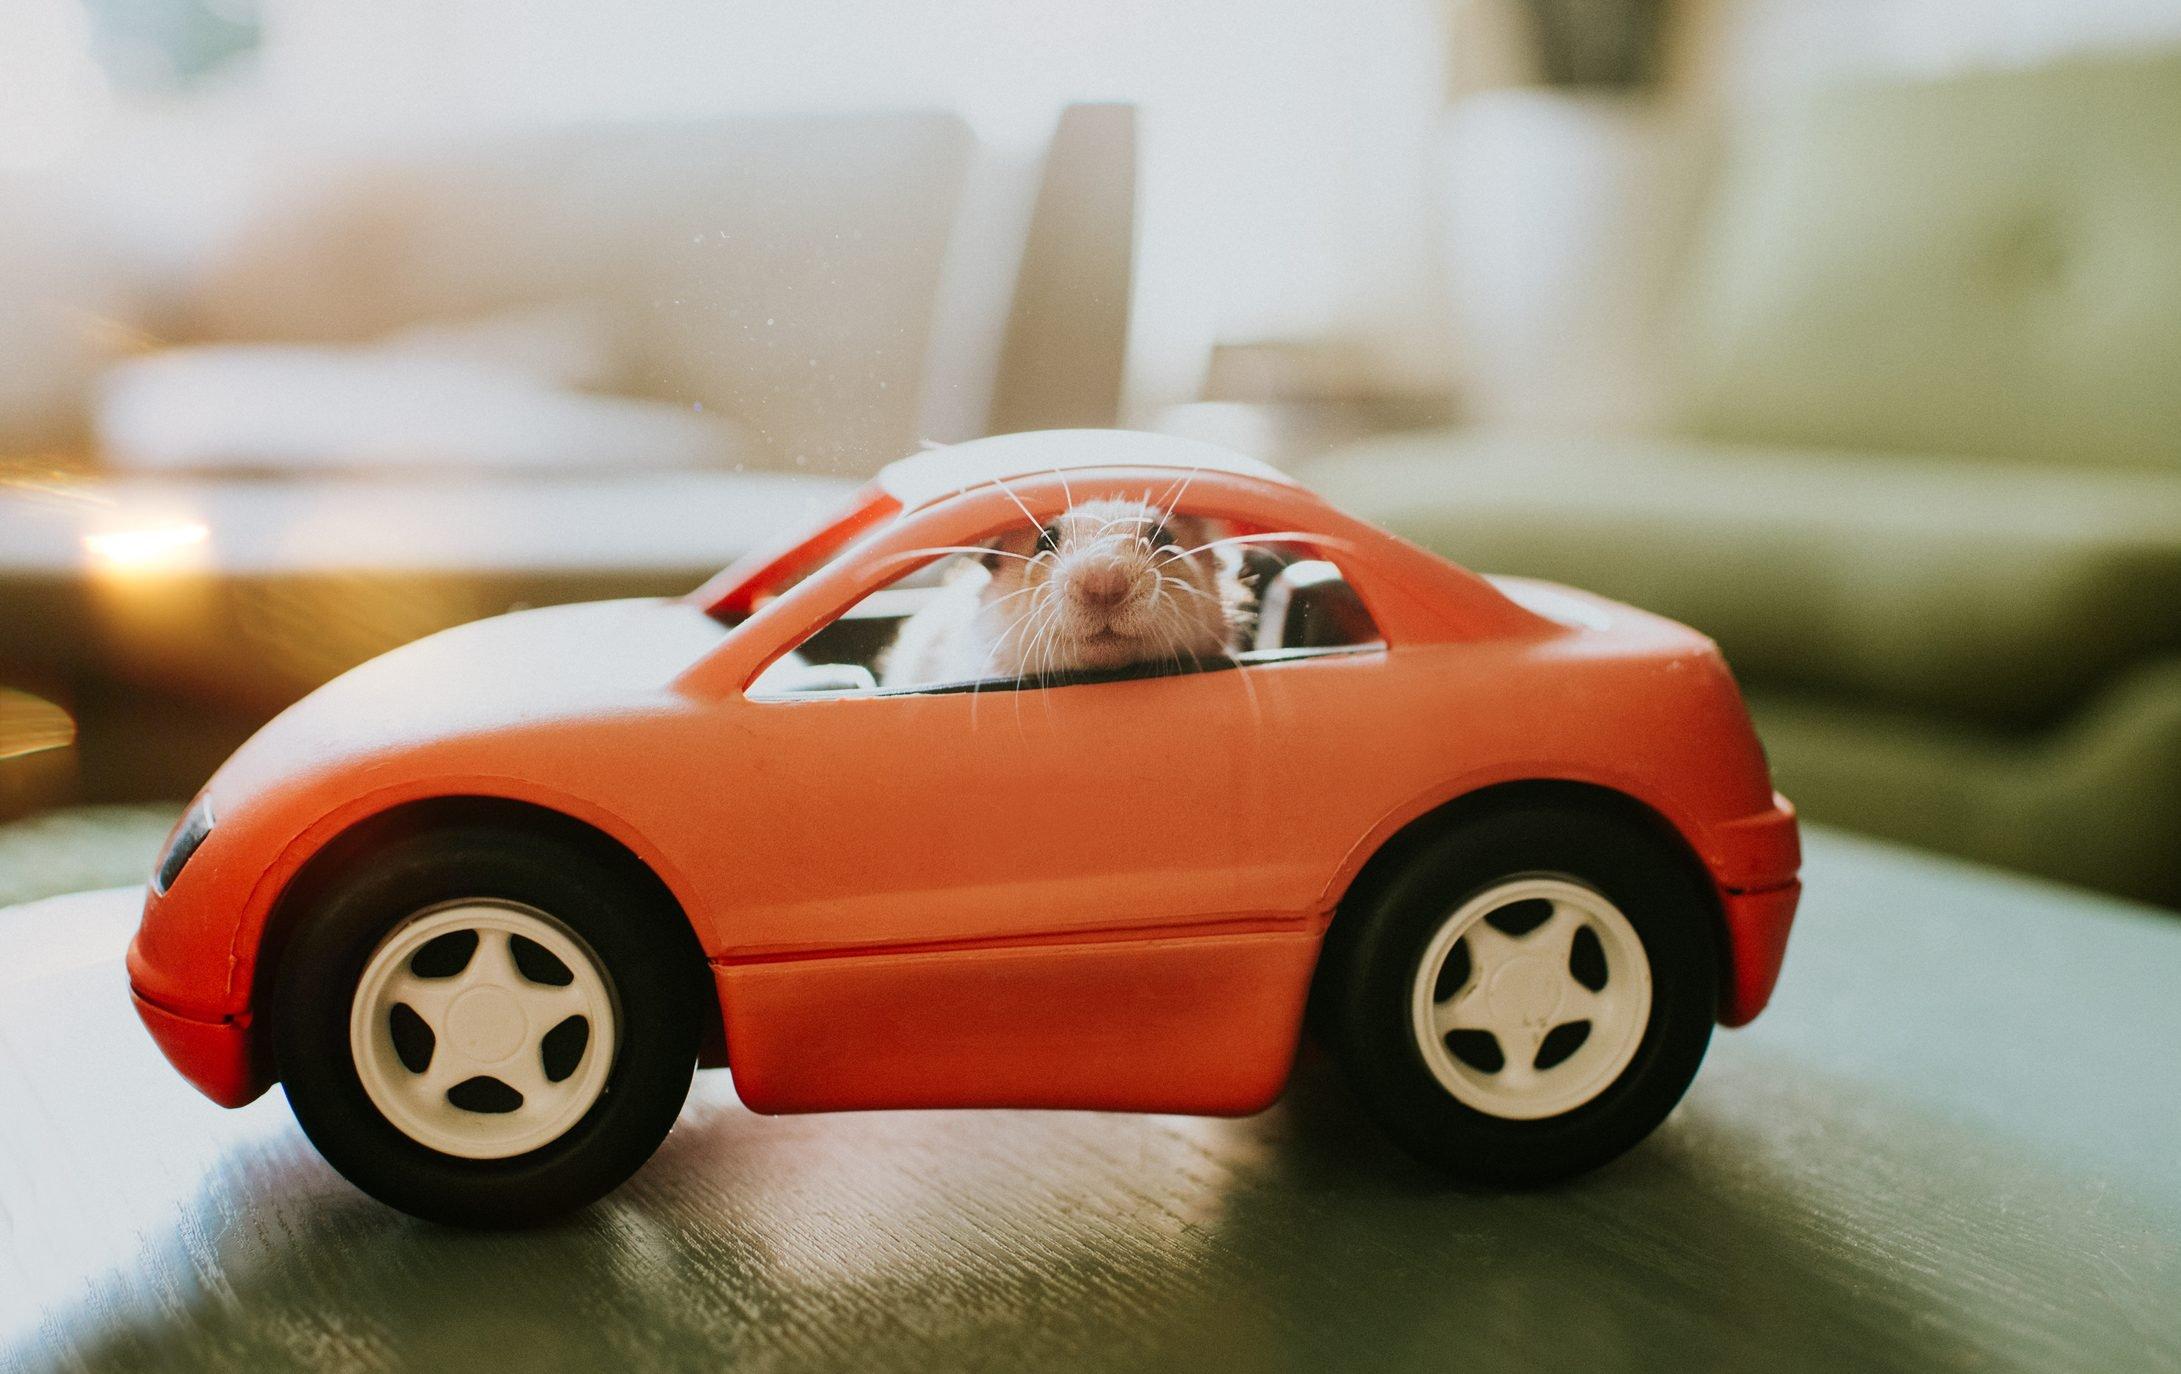 Hamster in a Car